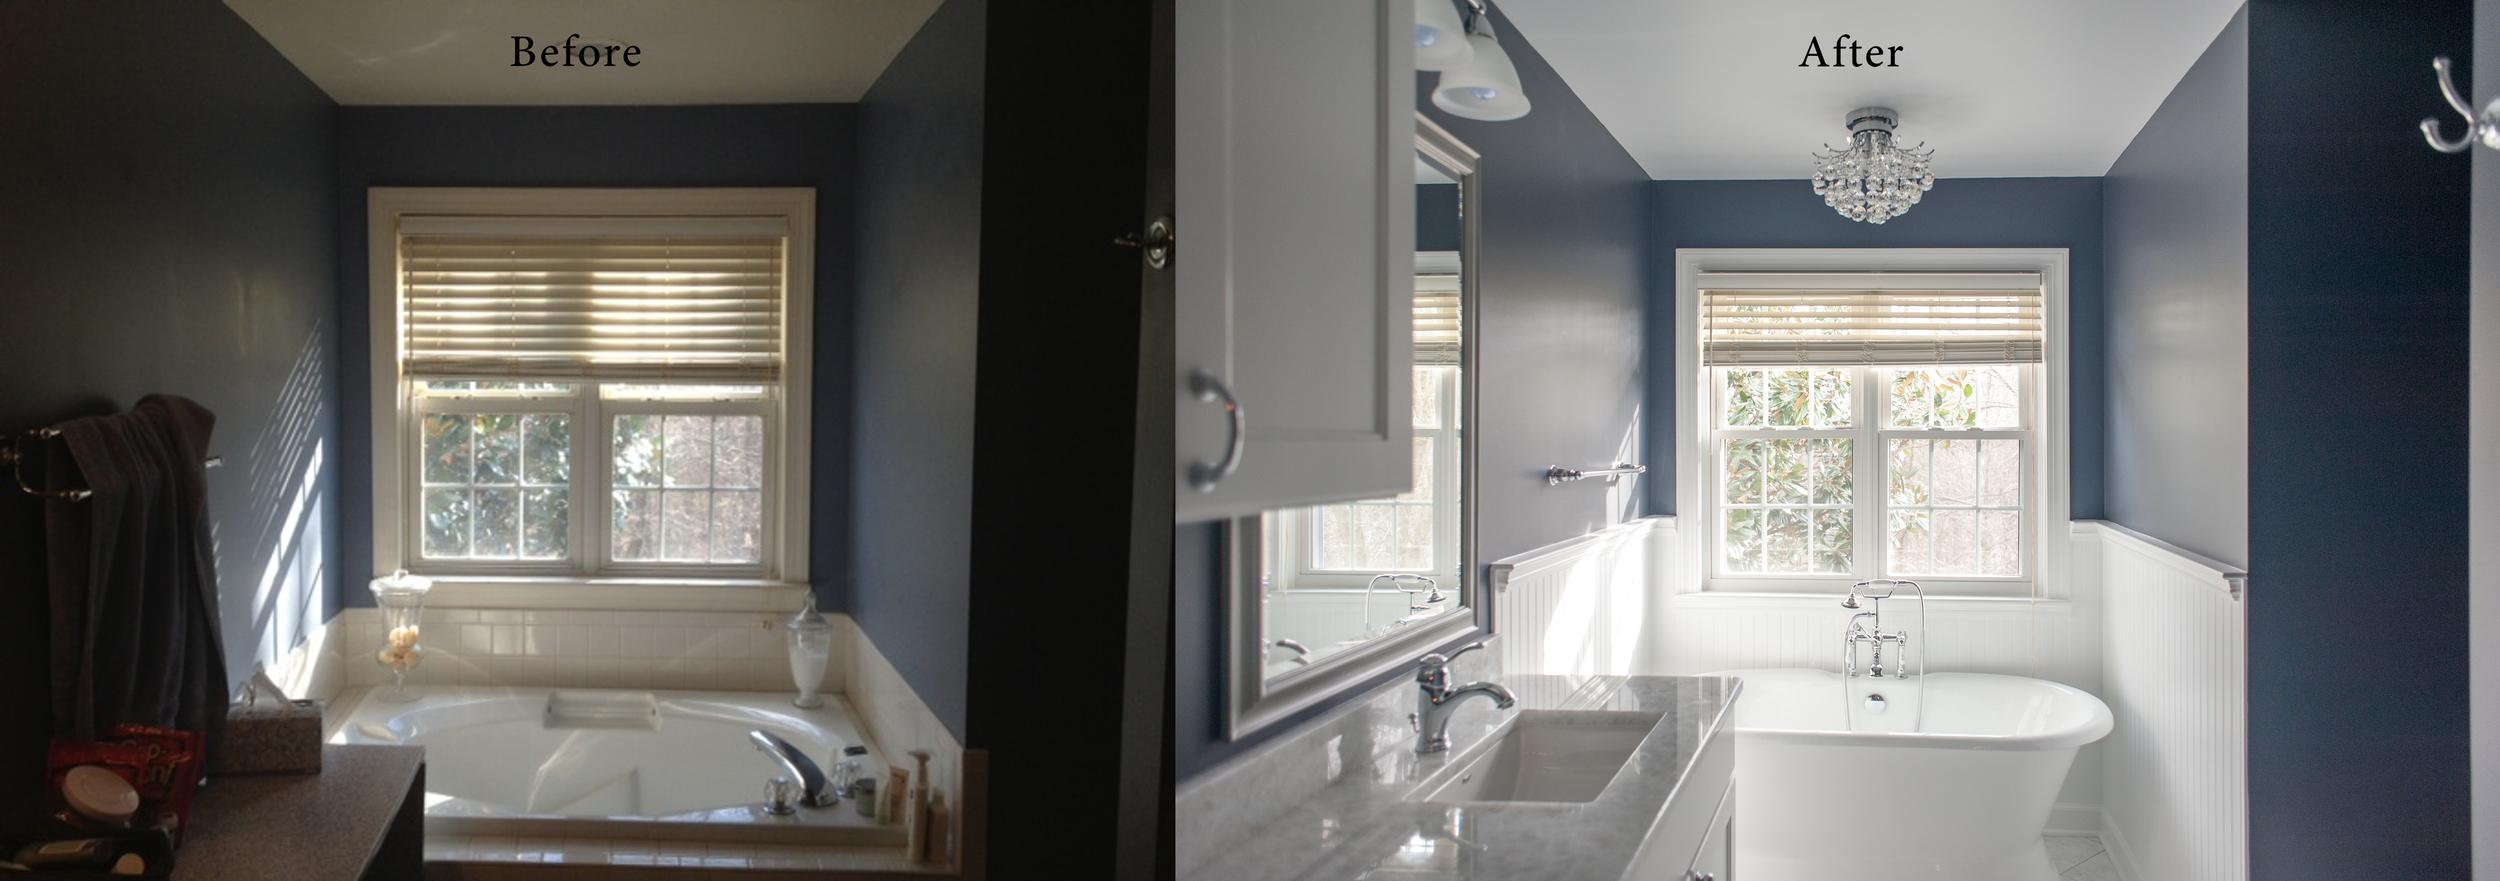 Bathroom renovation Silver Spring, MD